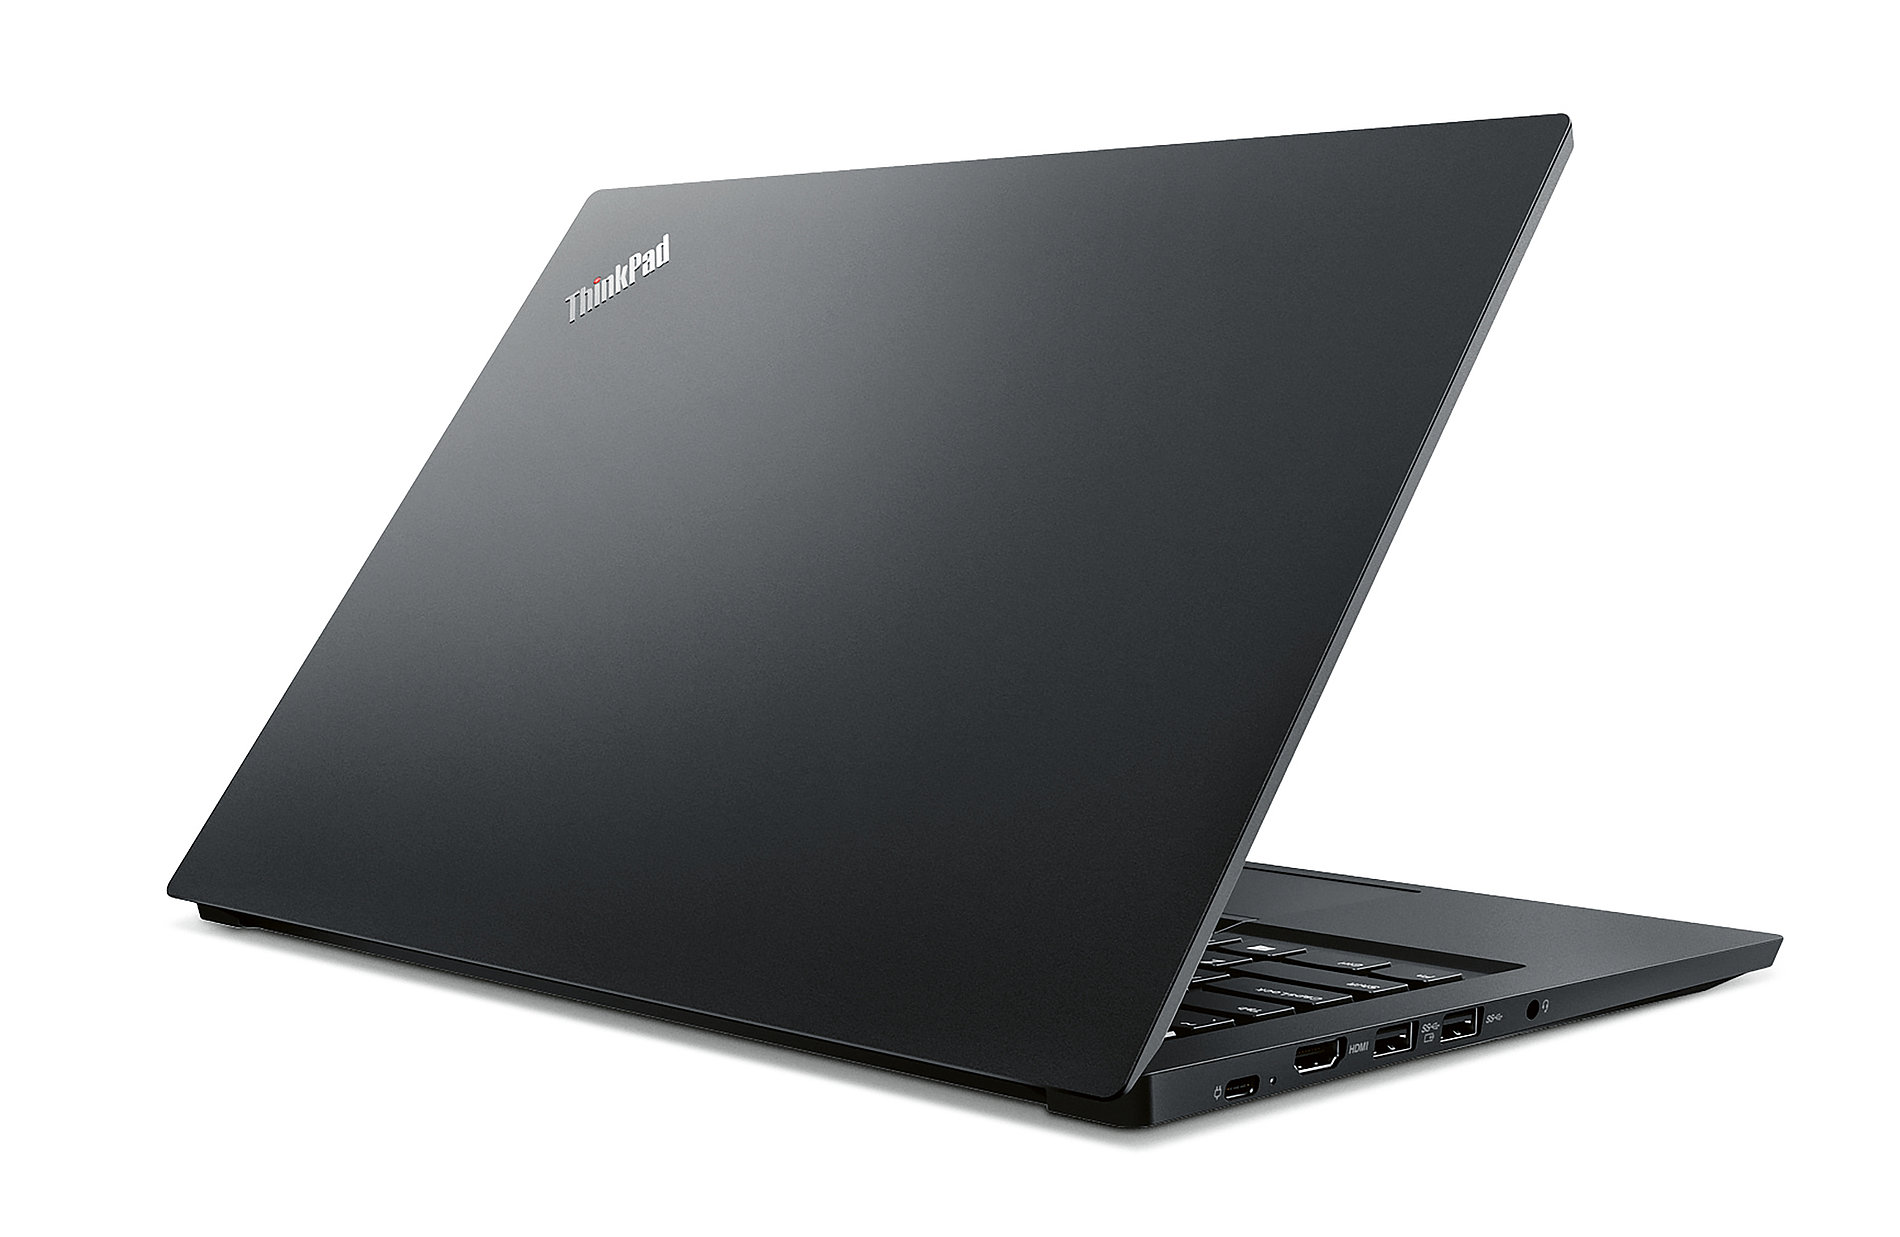 ThinkPad E490s | Red Dot Design Award